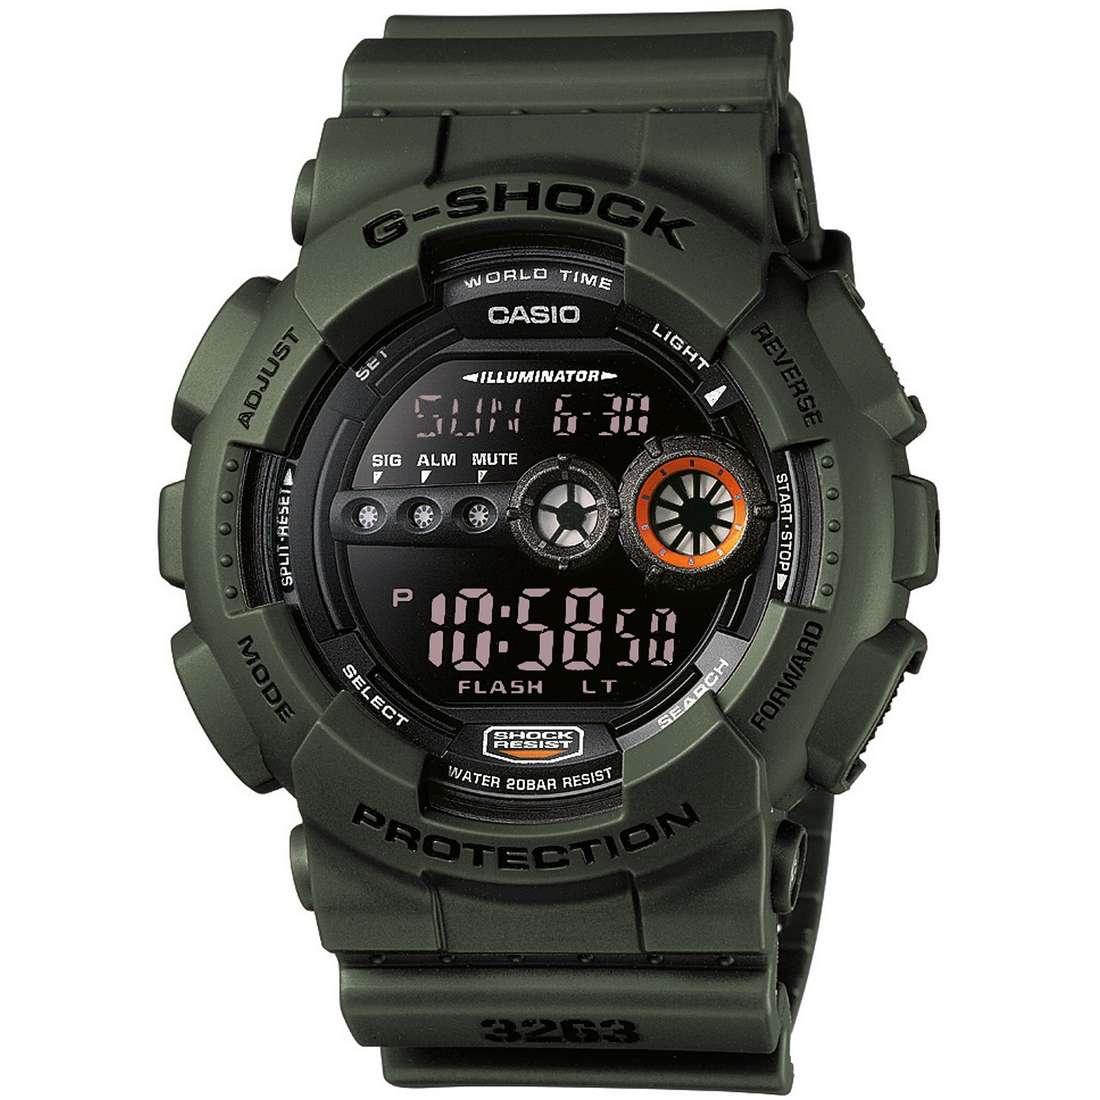 watch chronograph man Casio G-SHOCK GD-100MS-3ER